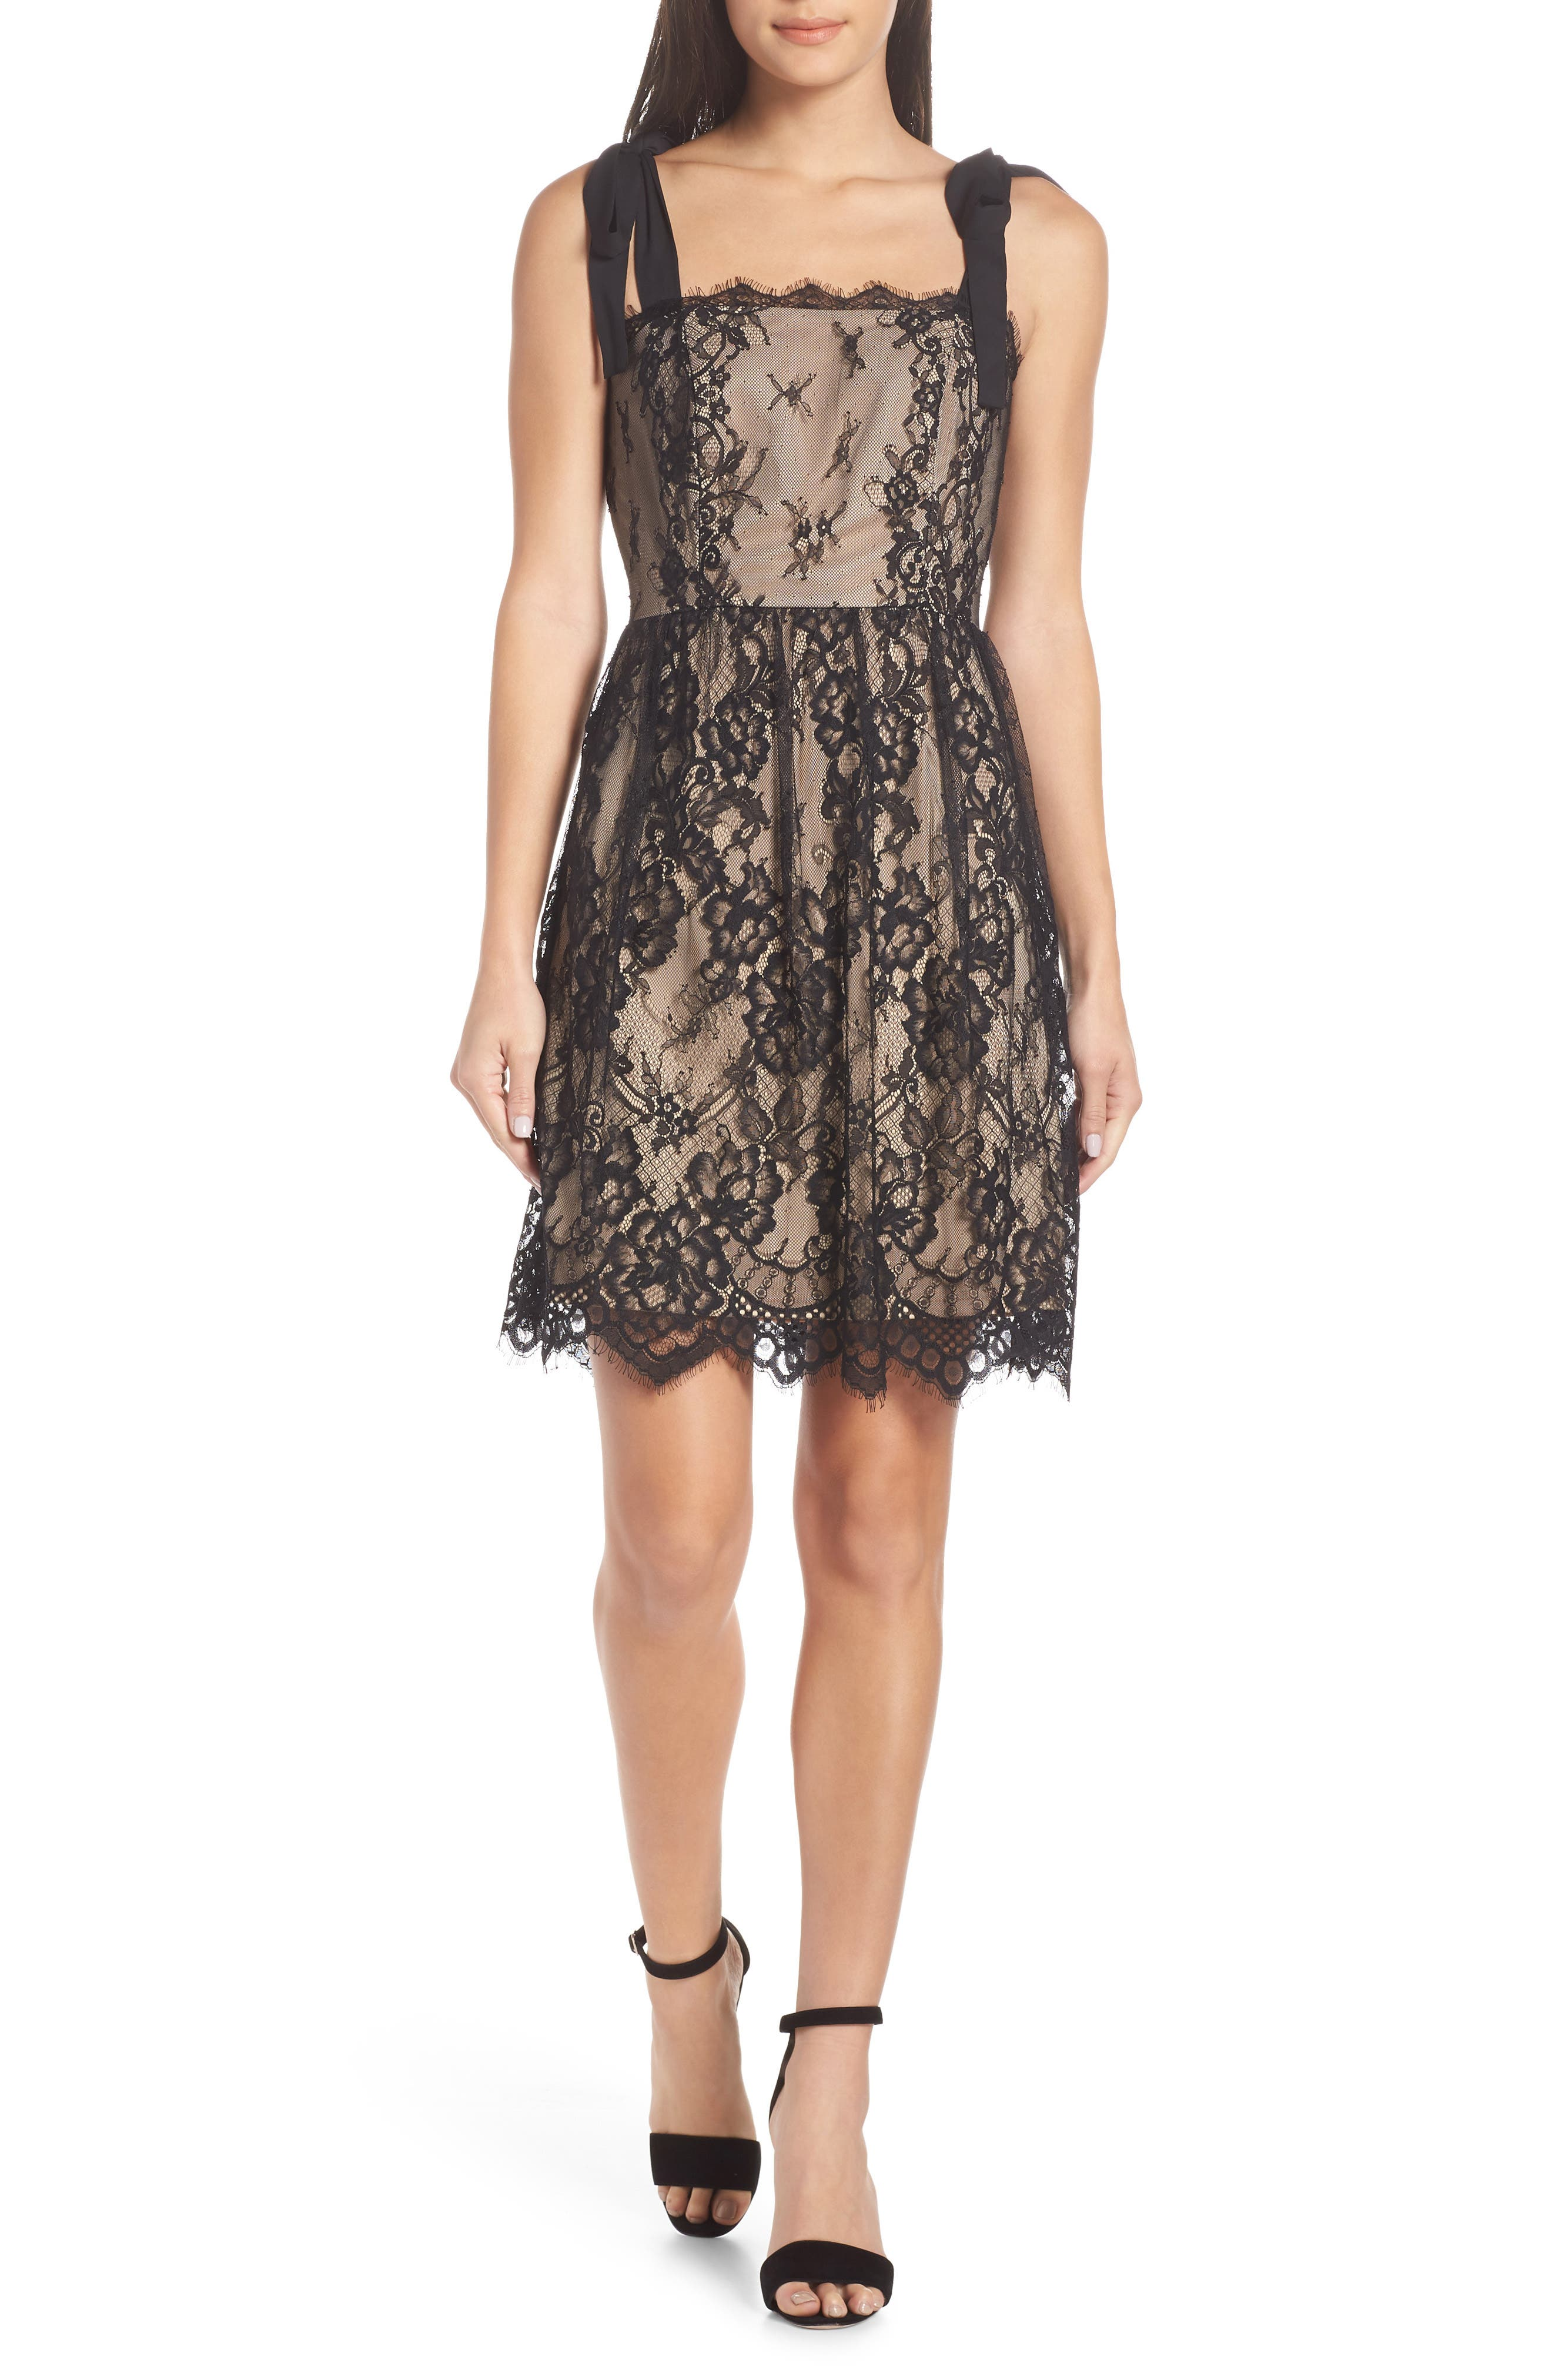 HEARTLOOM Emma Fit & Flare Lace Dress in Black